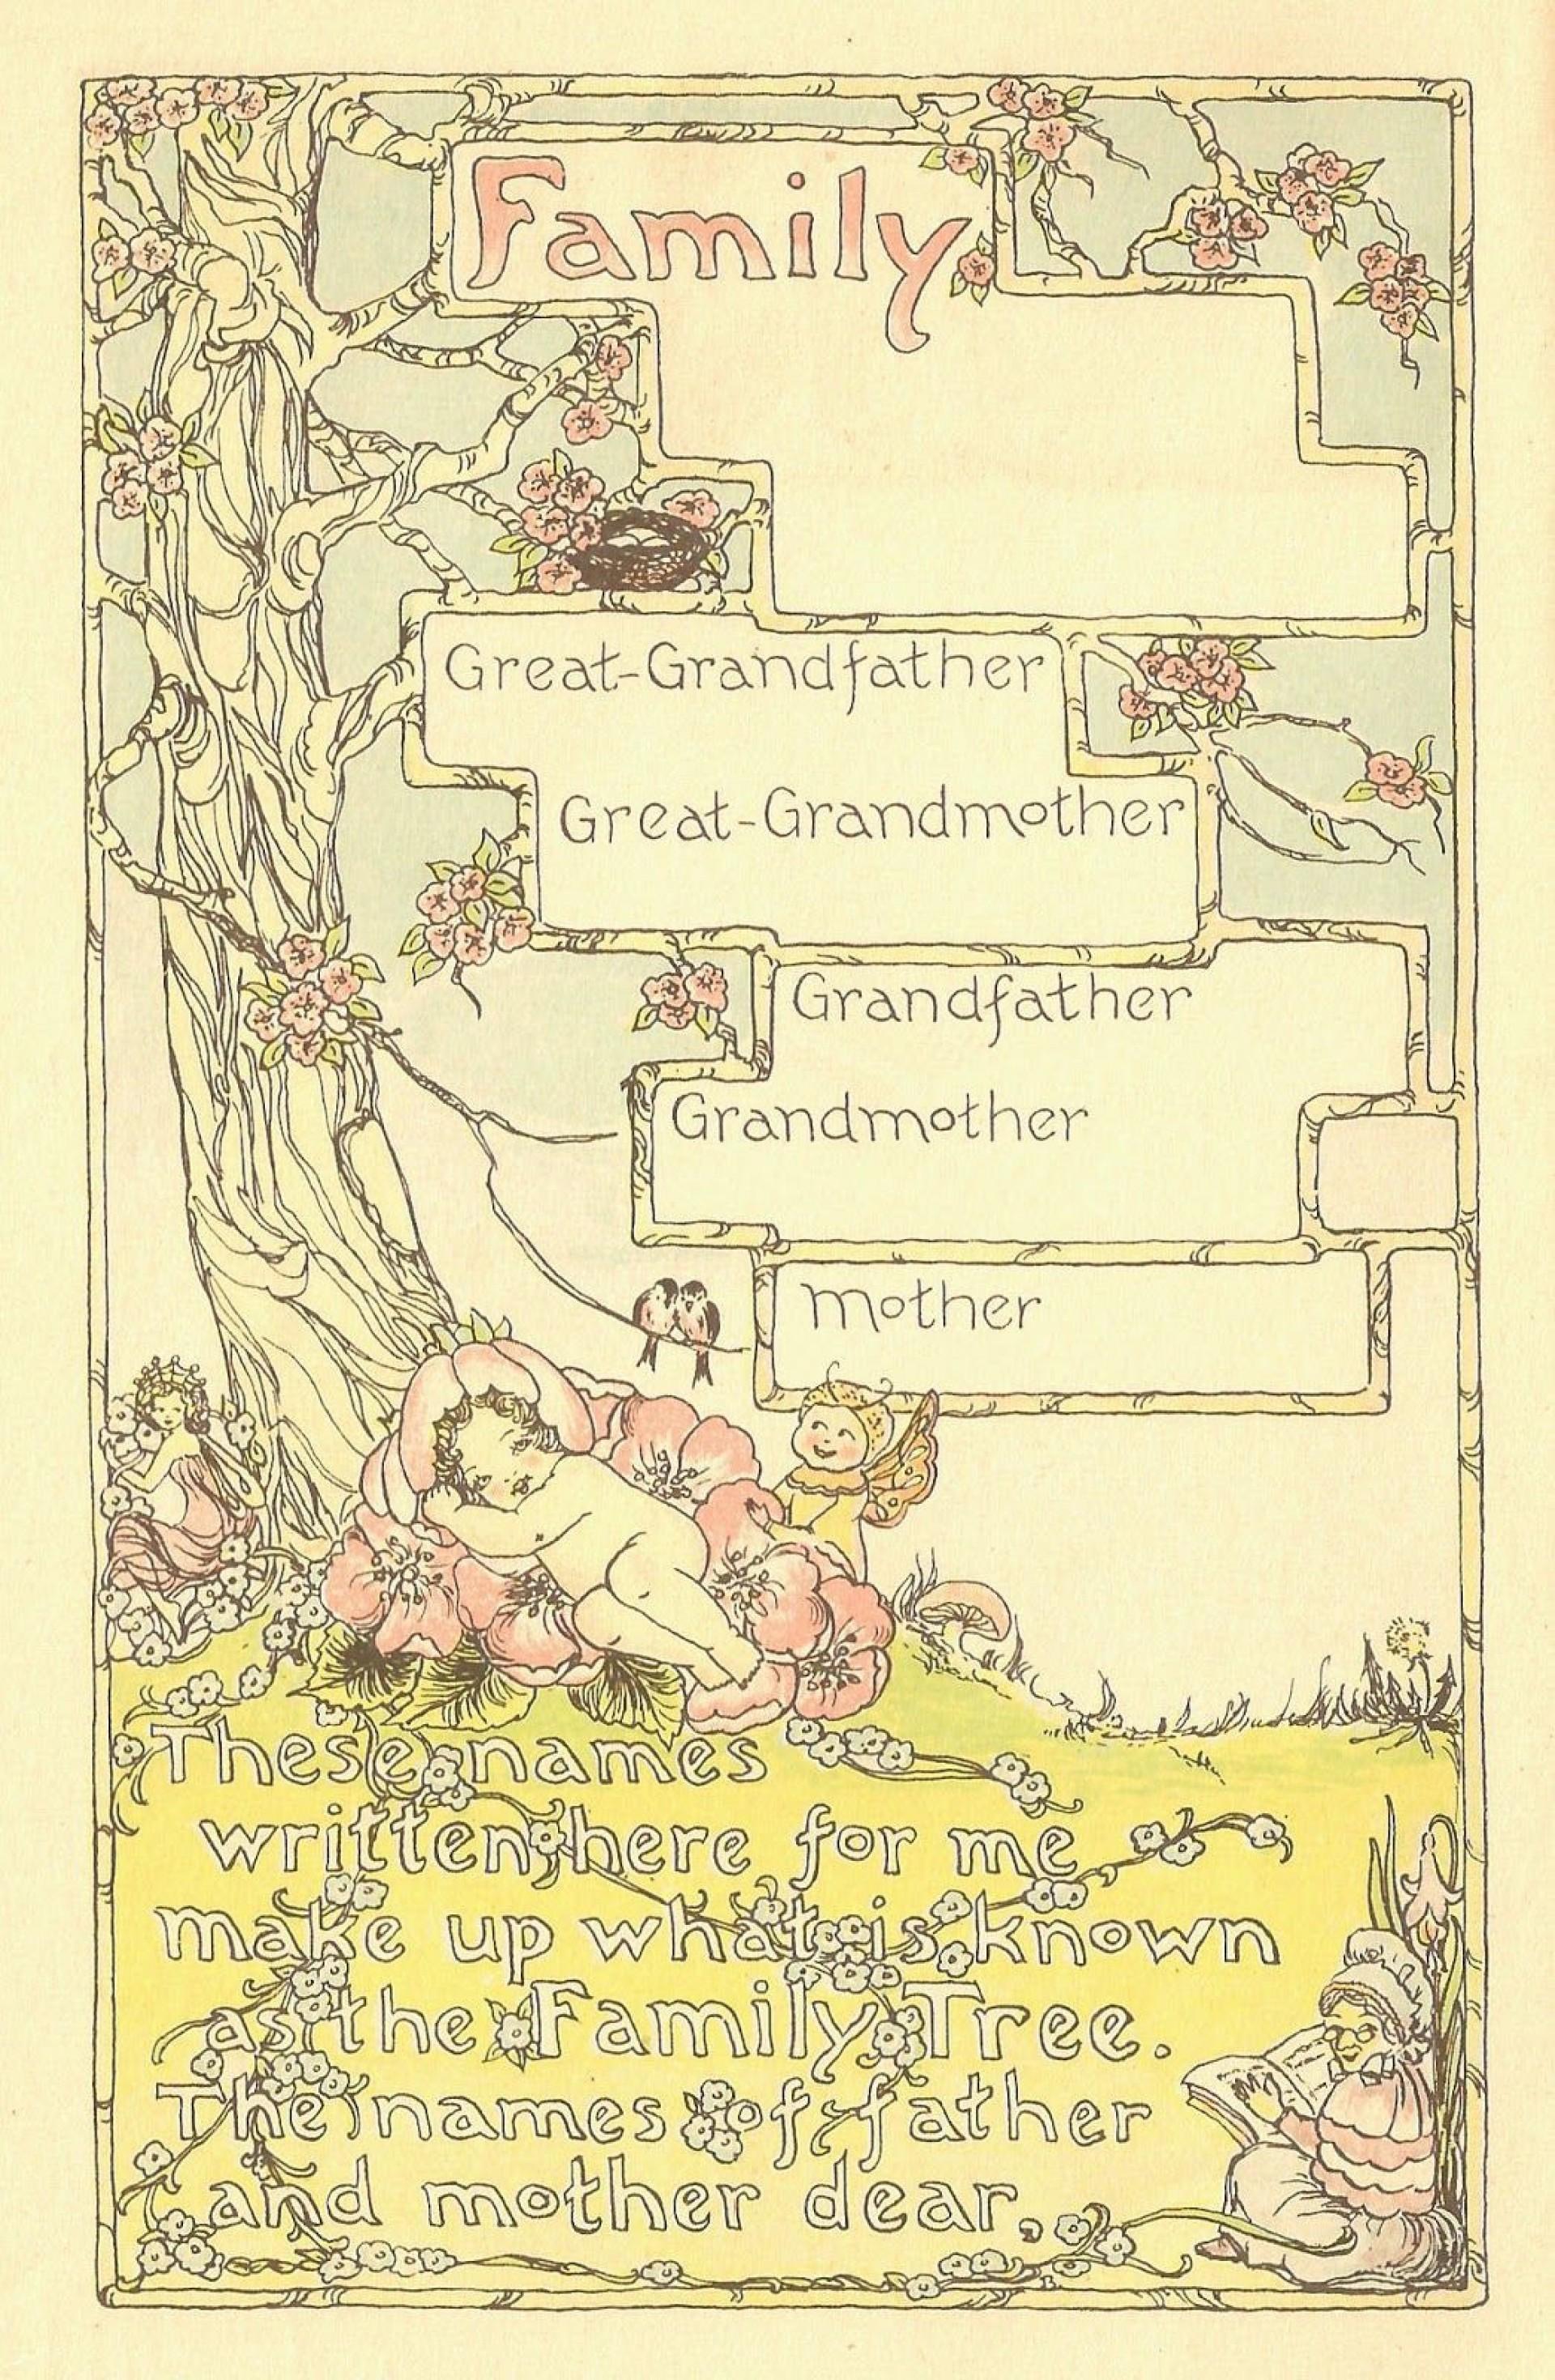 000 Rare Family Tree Book Template Free Photo  History1920